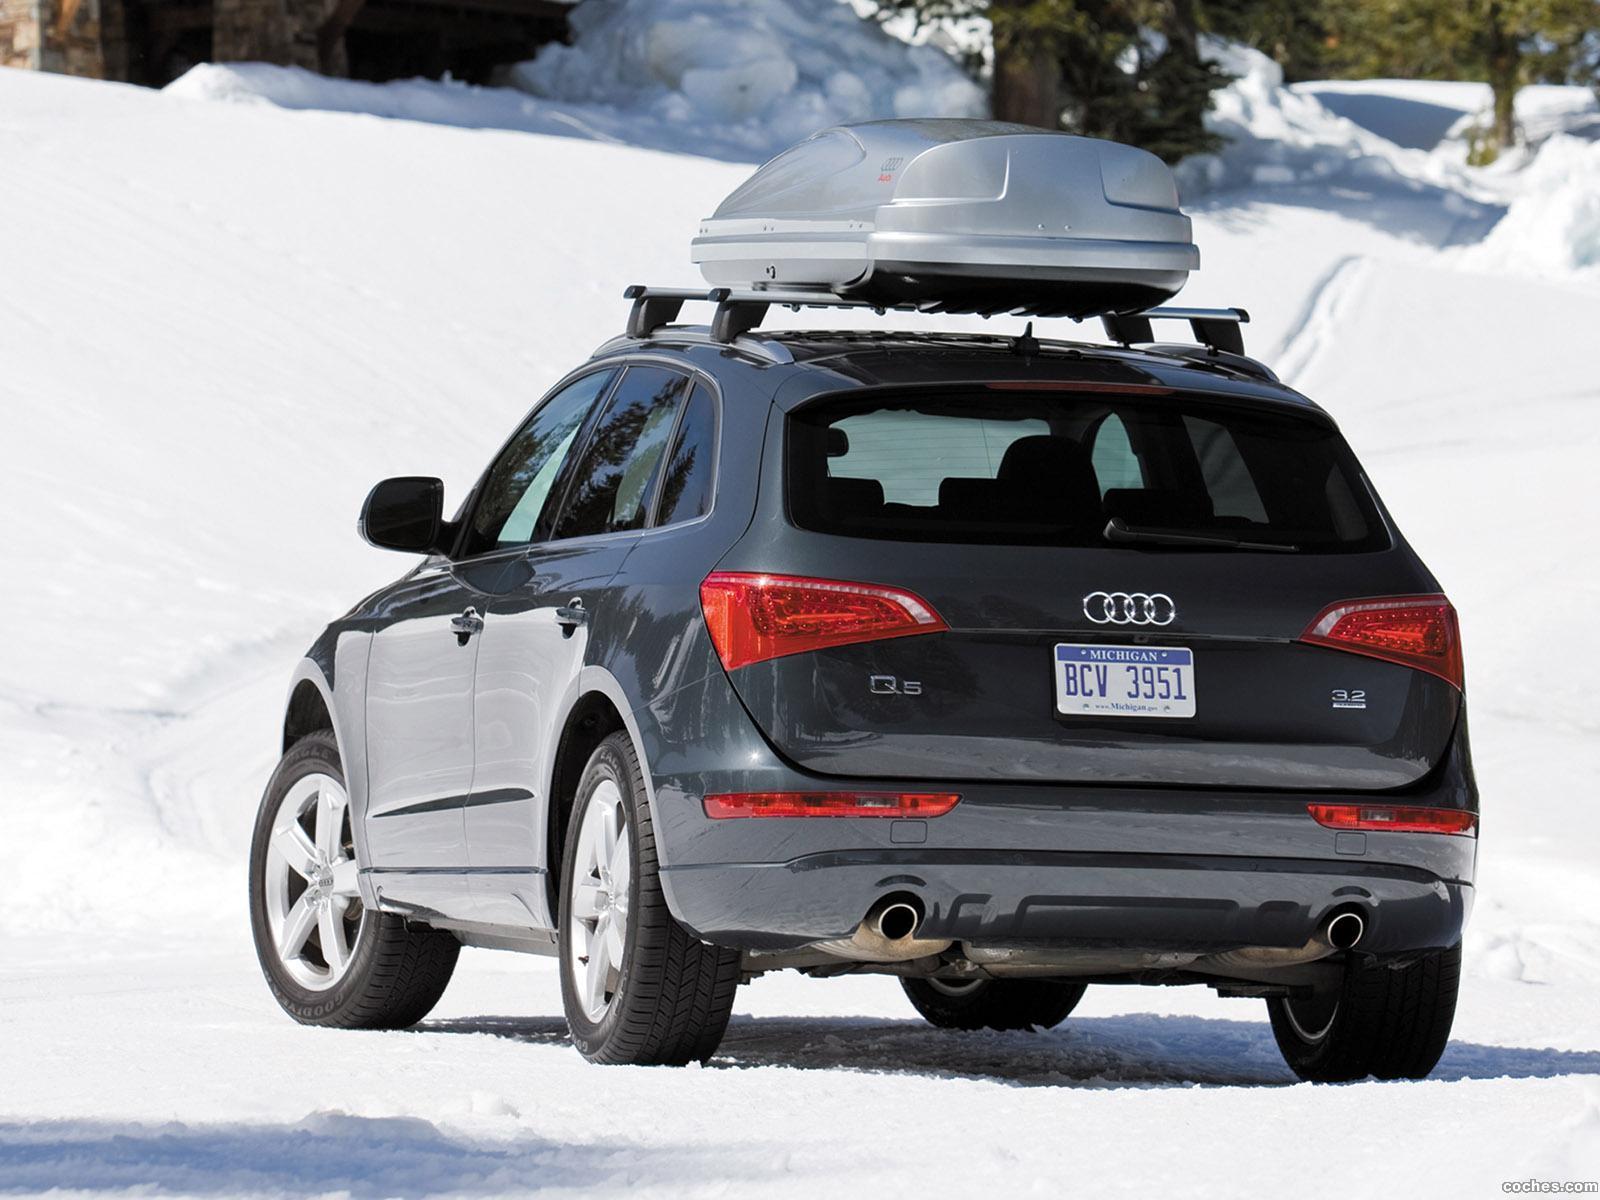 Foto 13 de Audi Q5 3.2 Quattro USA 2009